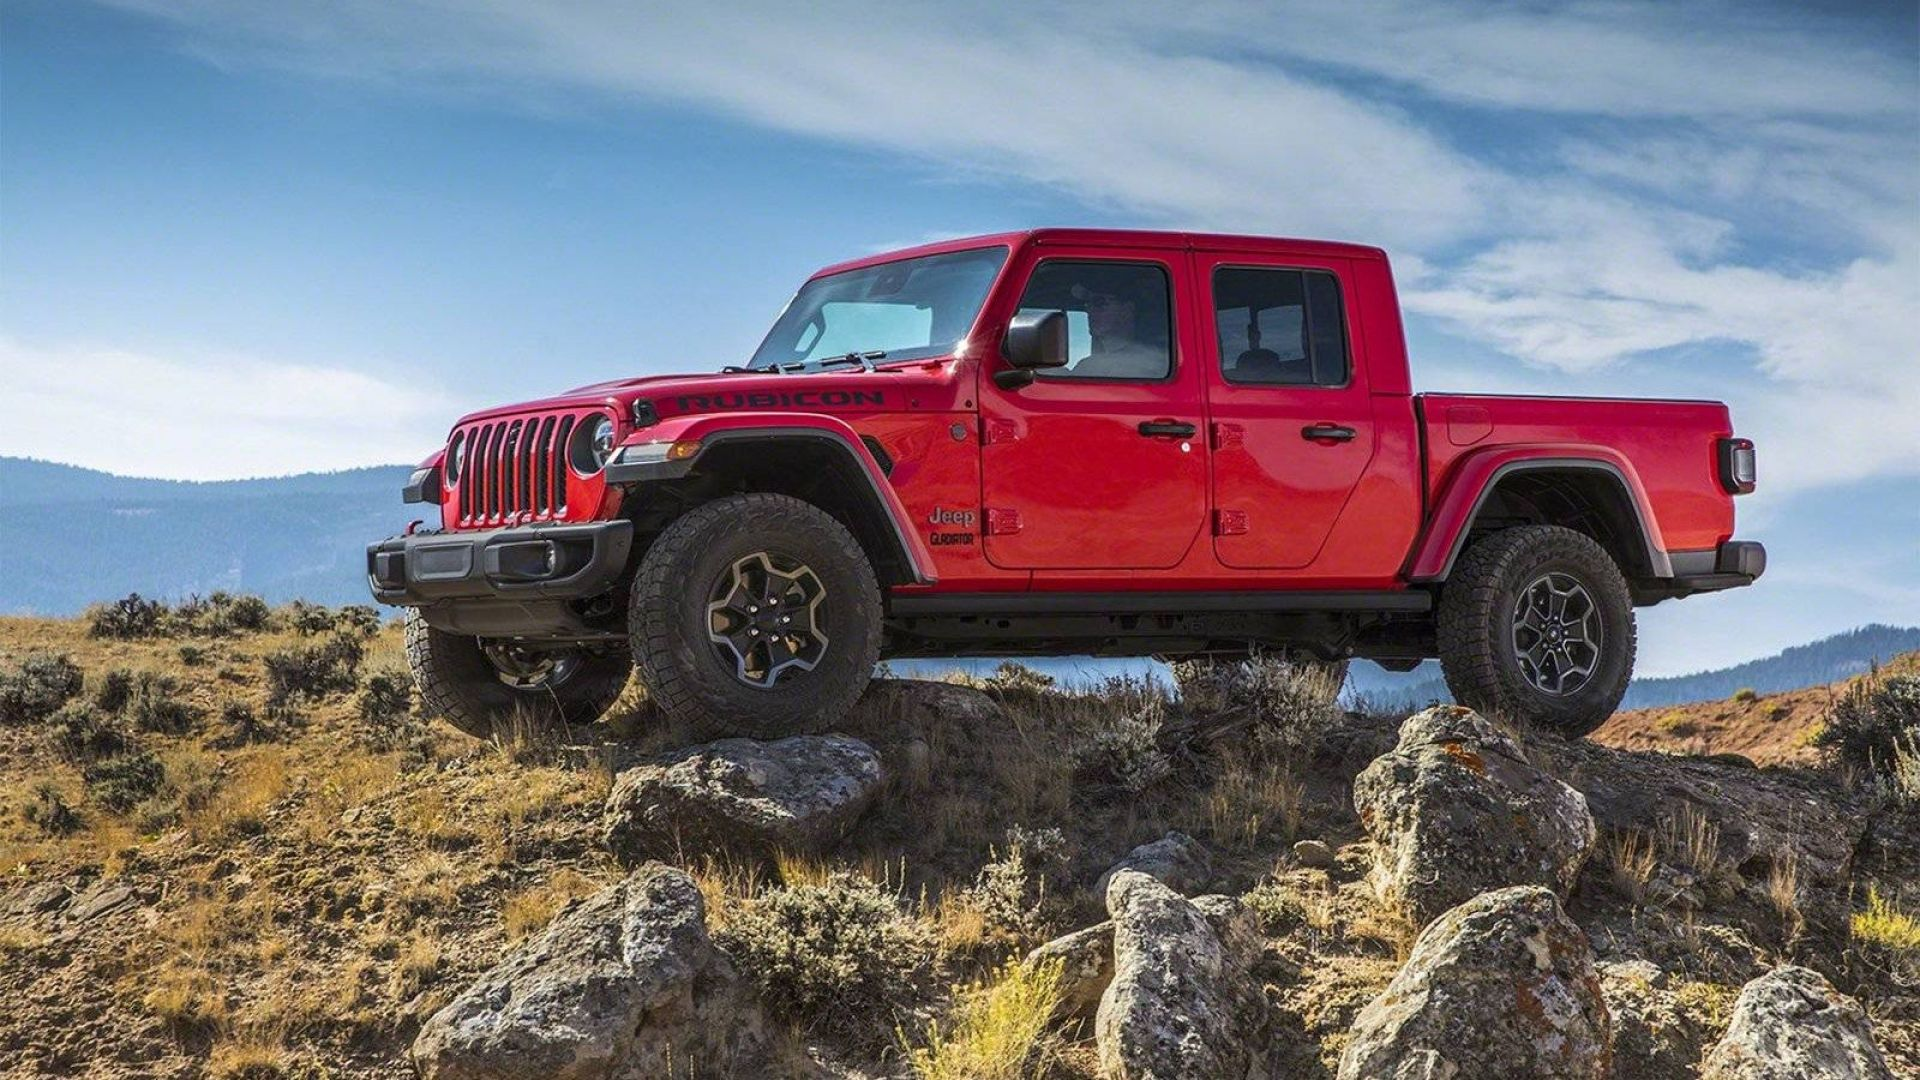 Nuova Jeep Gladiator Pick Up 2019 Motori Caratterstiche